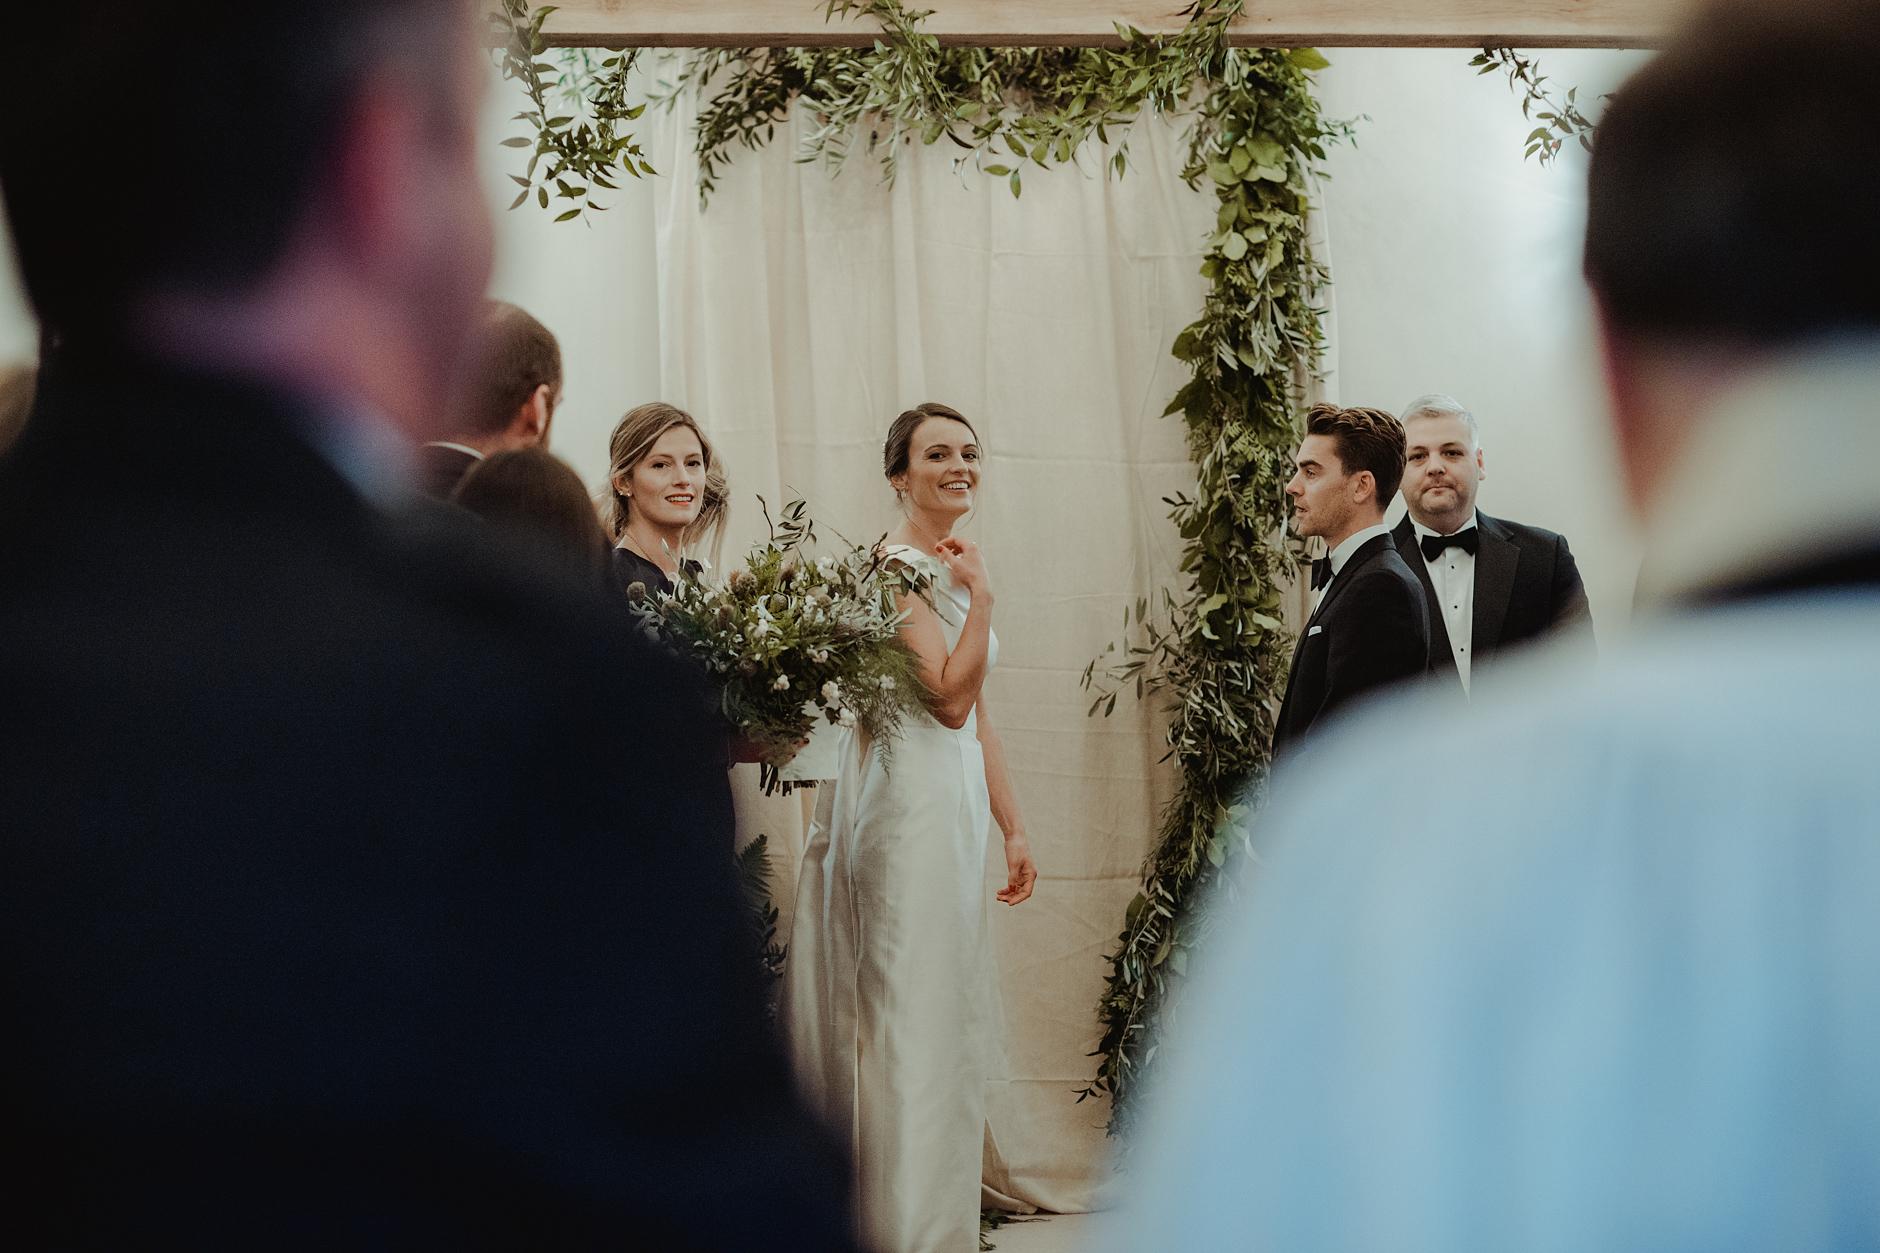 Glentruim-Wedding-Nikki-Leadbetter-Photography-79.jpg